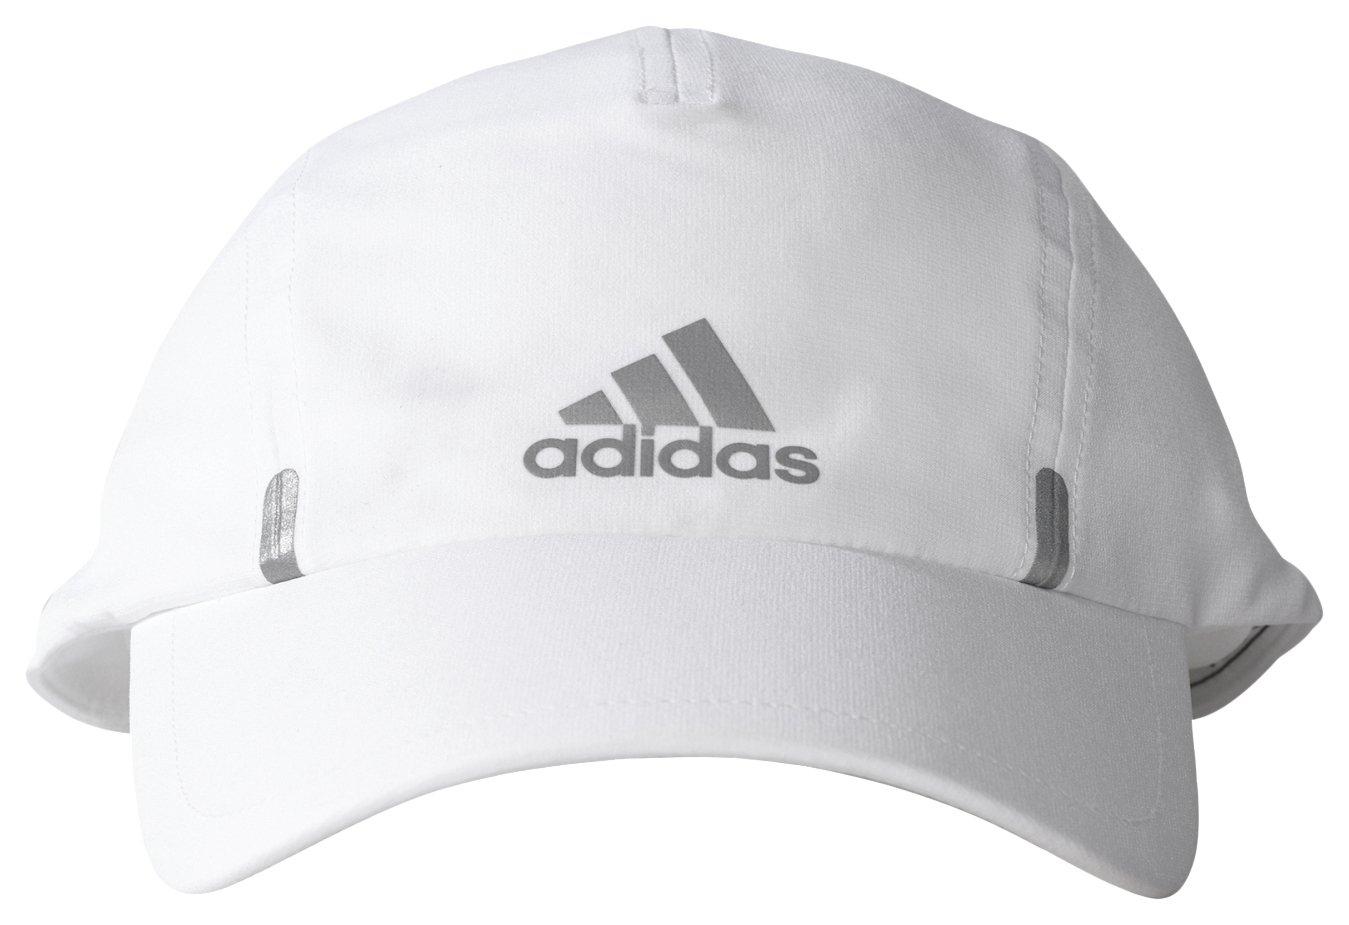 2772a07488e adidas Run Climalite tennis cap  Amazon.co.uk  Sports   Outdoors